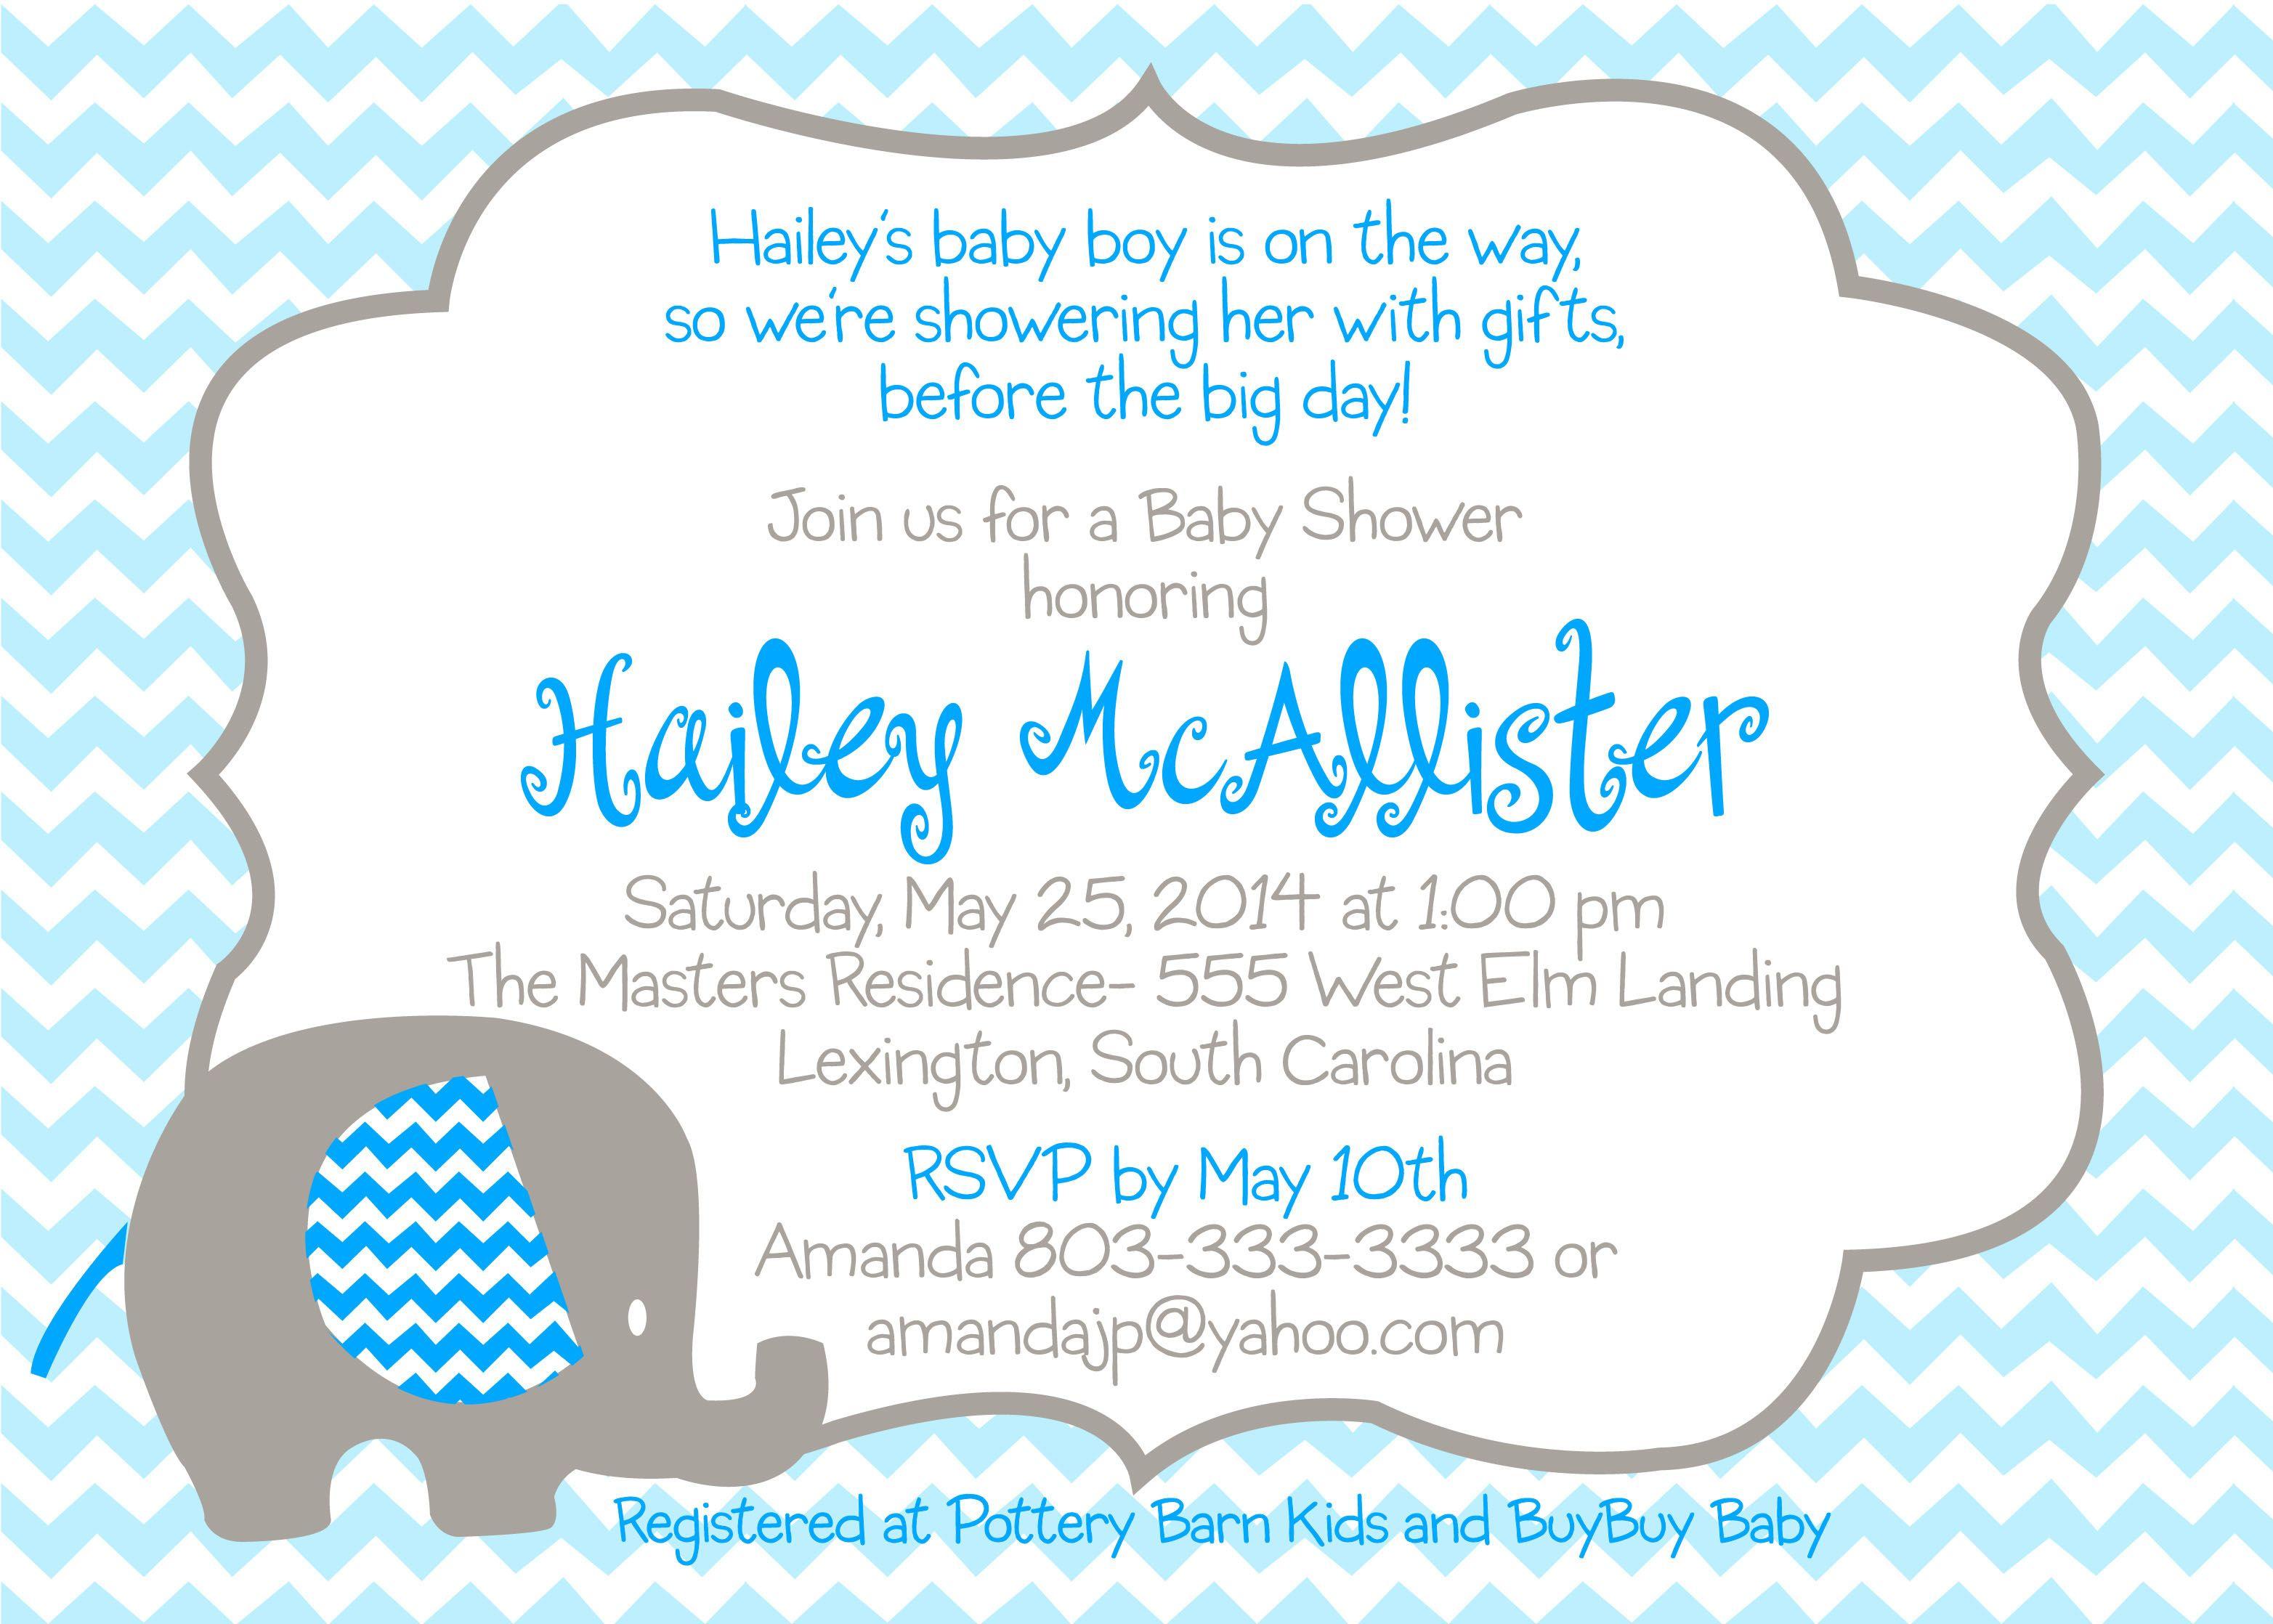 Baby Blue Elephant Shower Invitations Invi On Free Horizontal Striped Blank Eleph